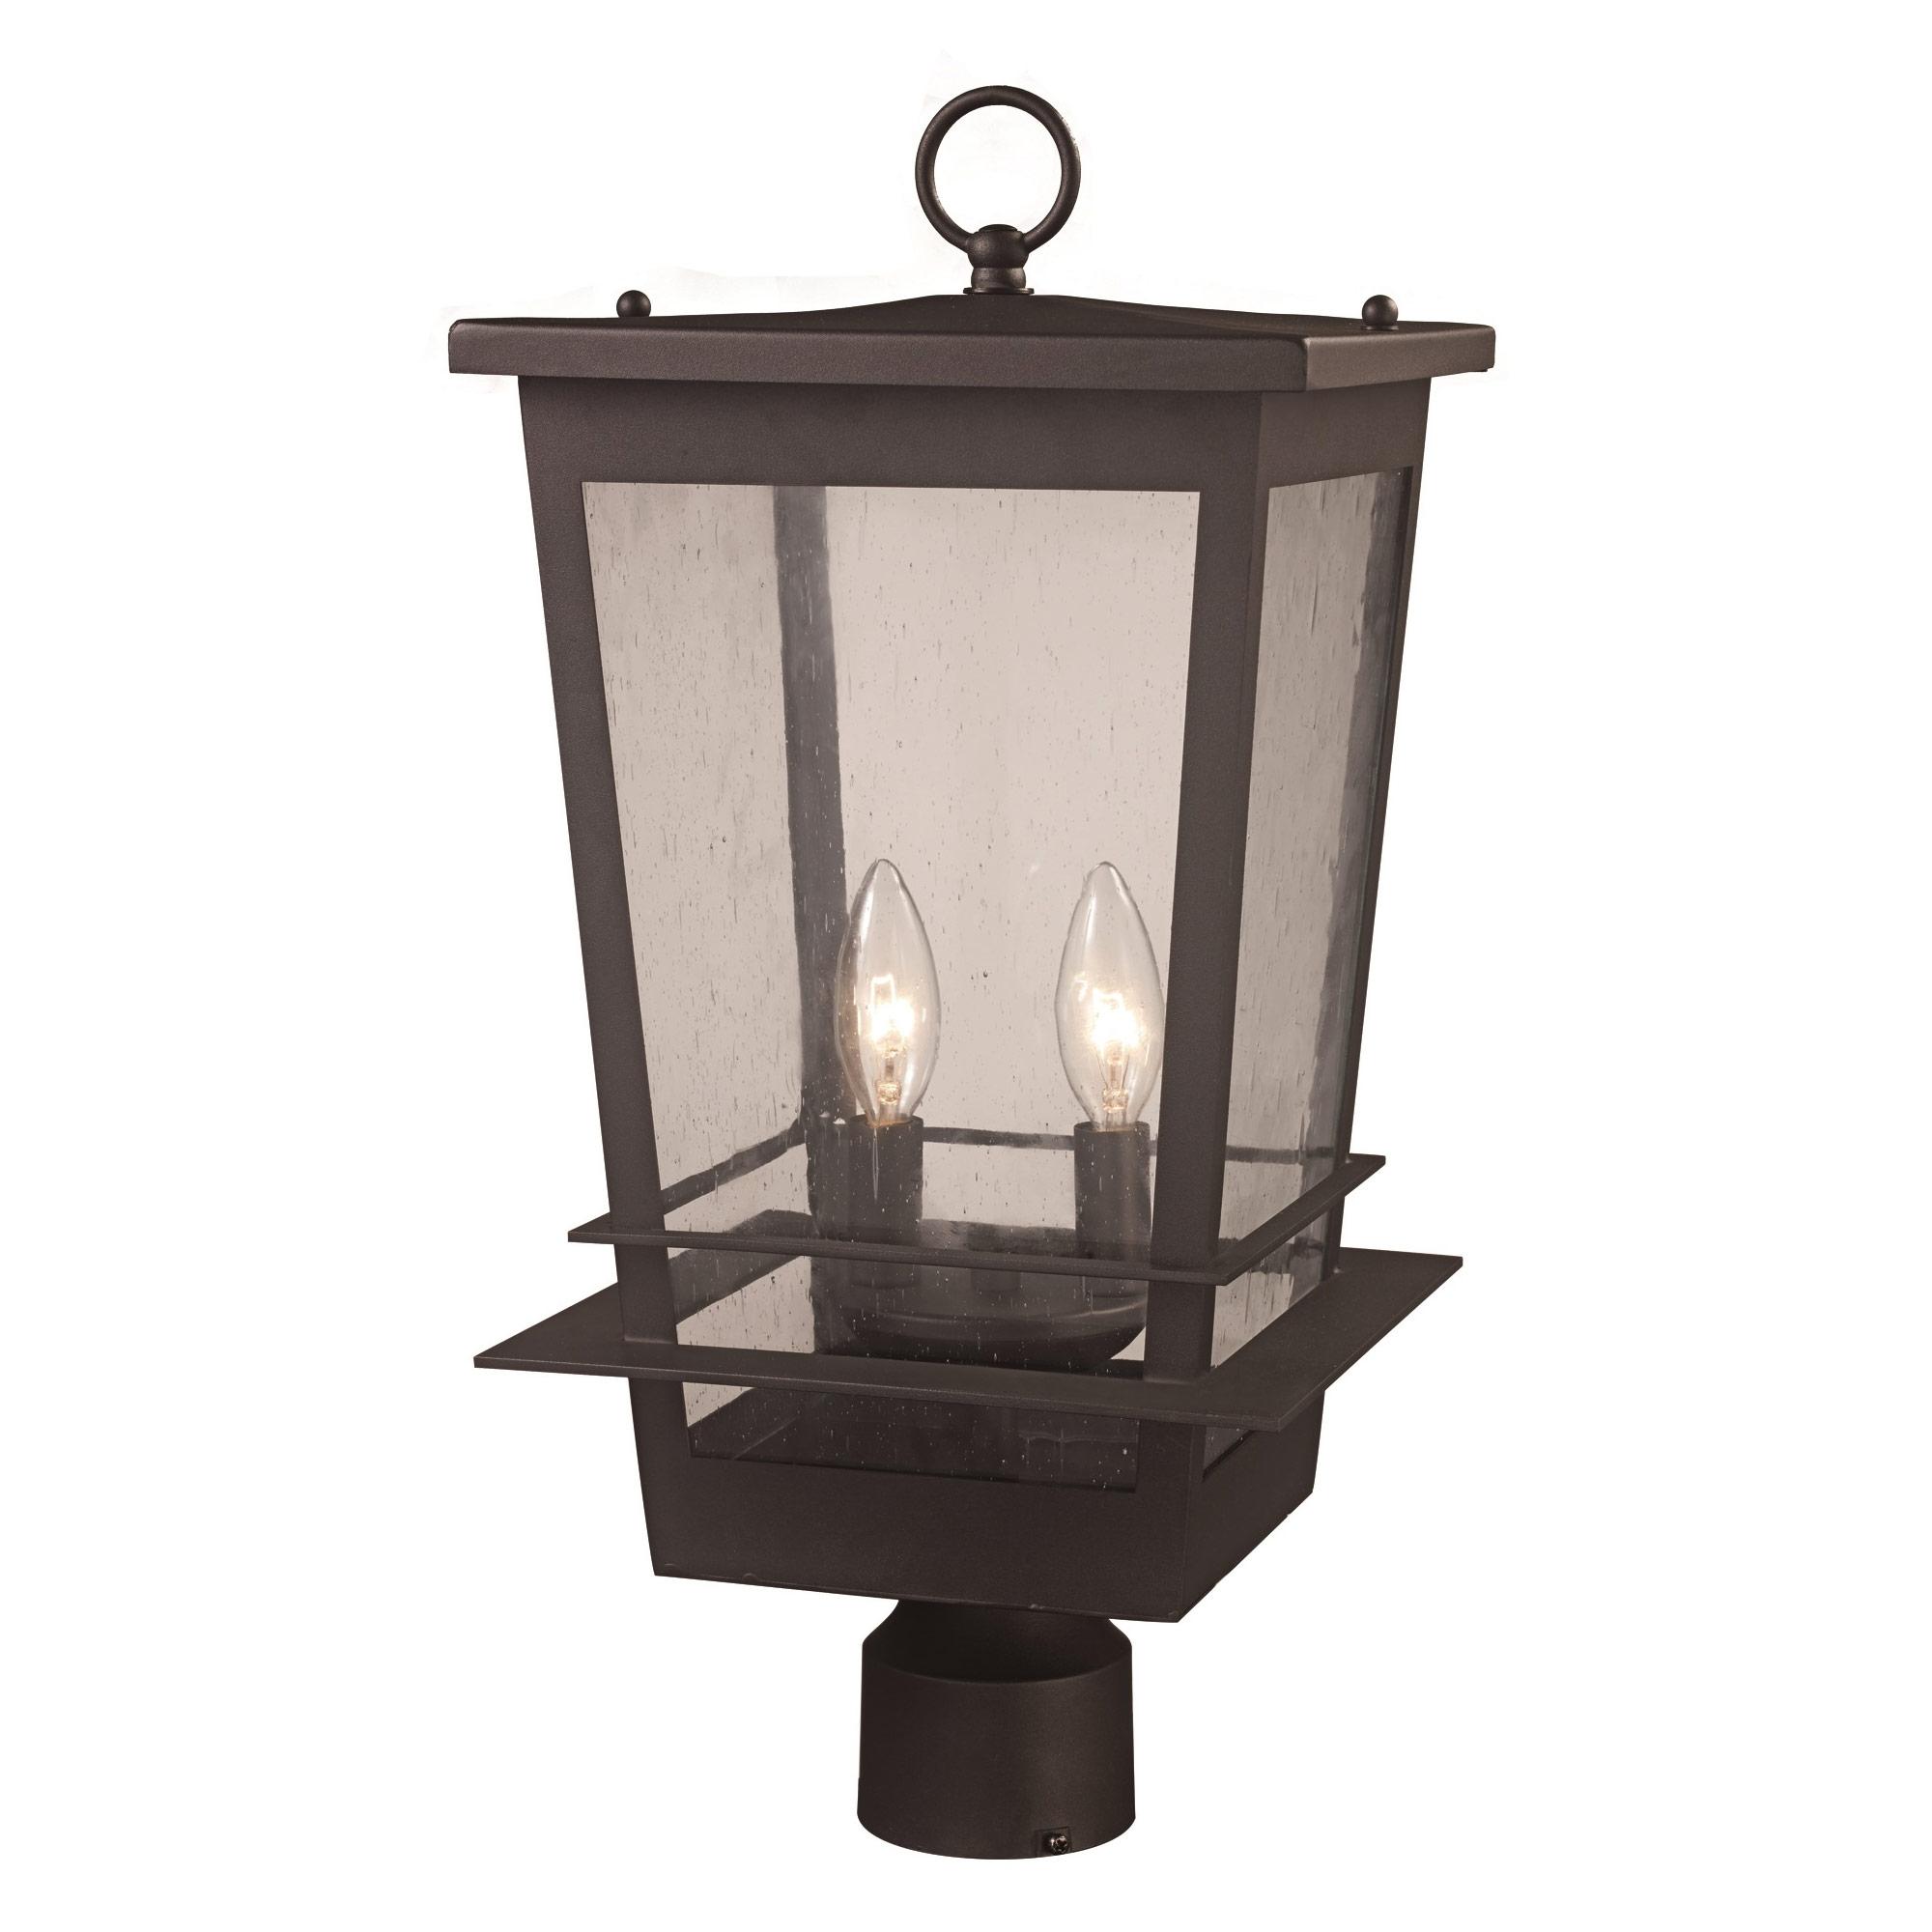 Craftsman Outdoor Post Light By Trans Globe 51024 2 Bk